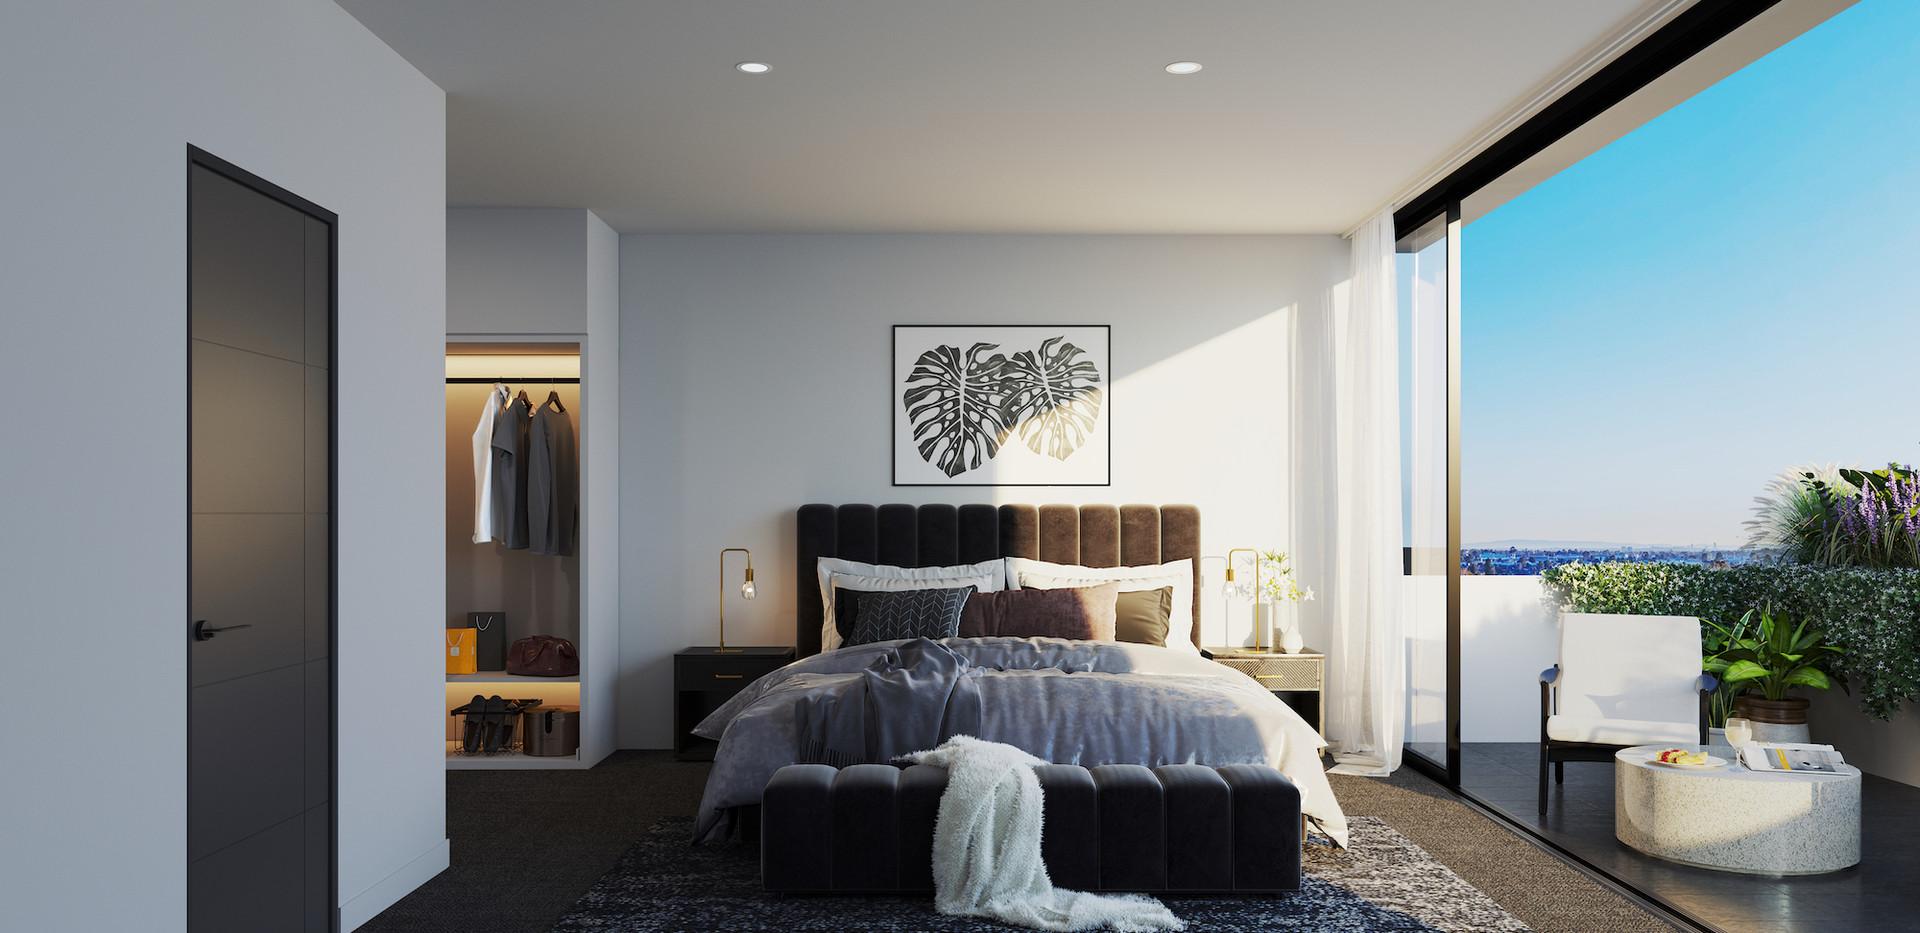 Luda Studios_Bedroom_Opt 1_Sml_Final.jpe